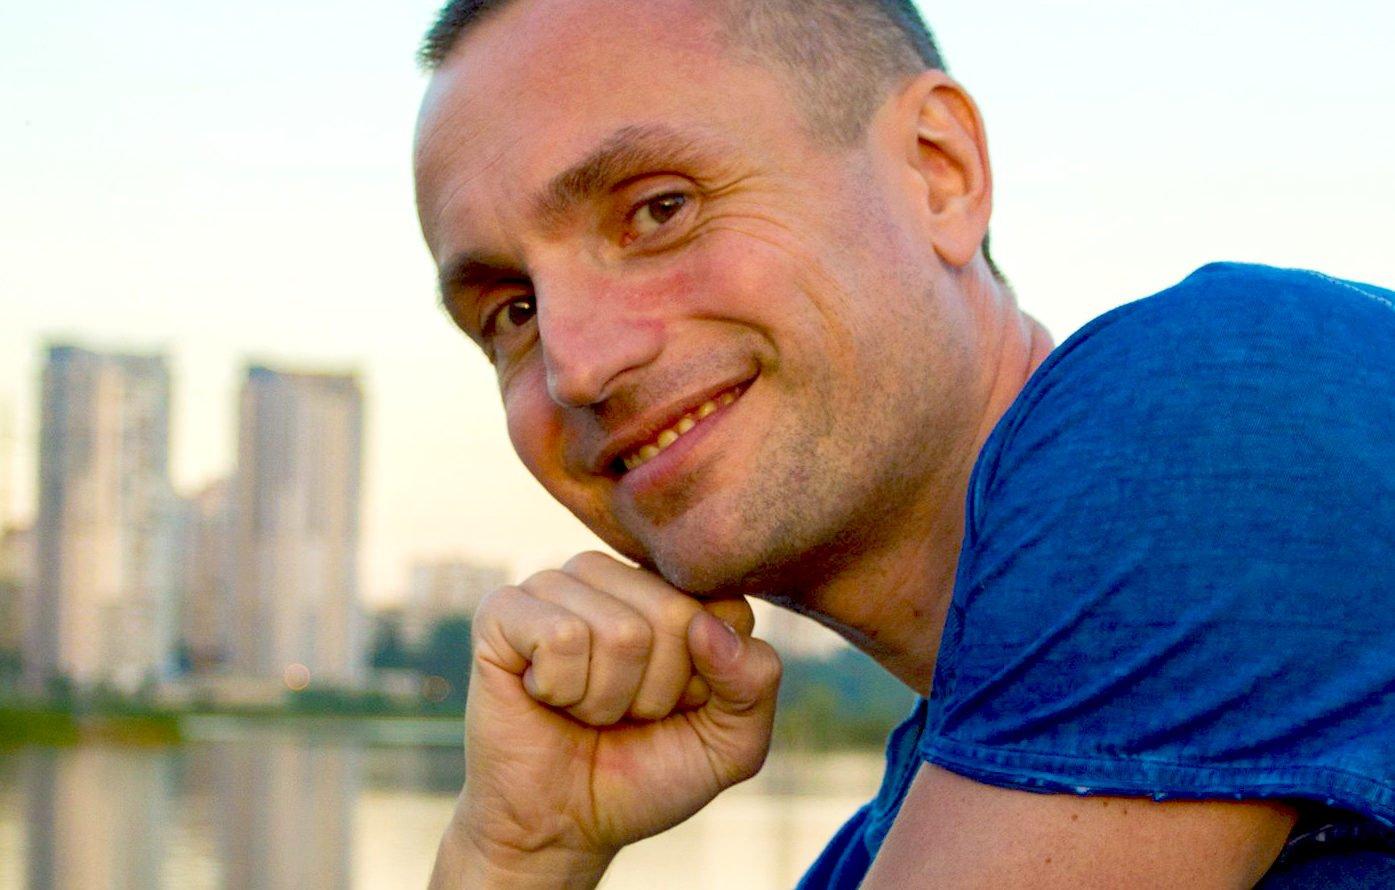 Alexander Radich